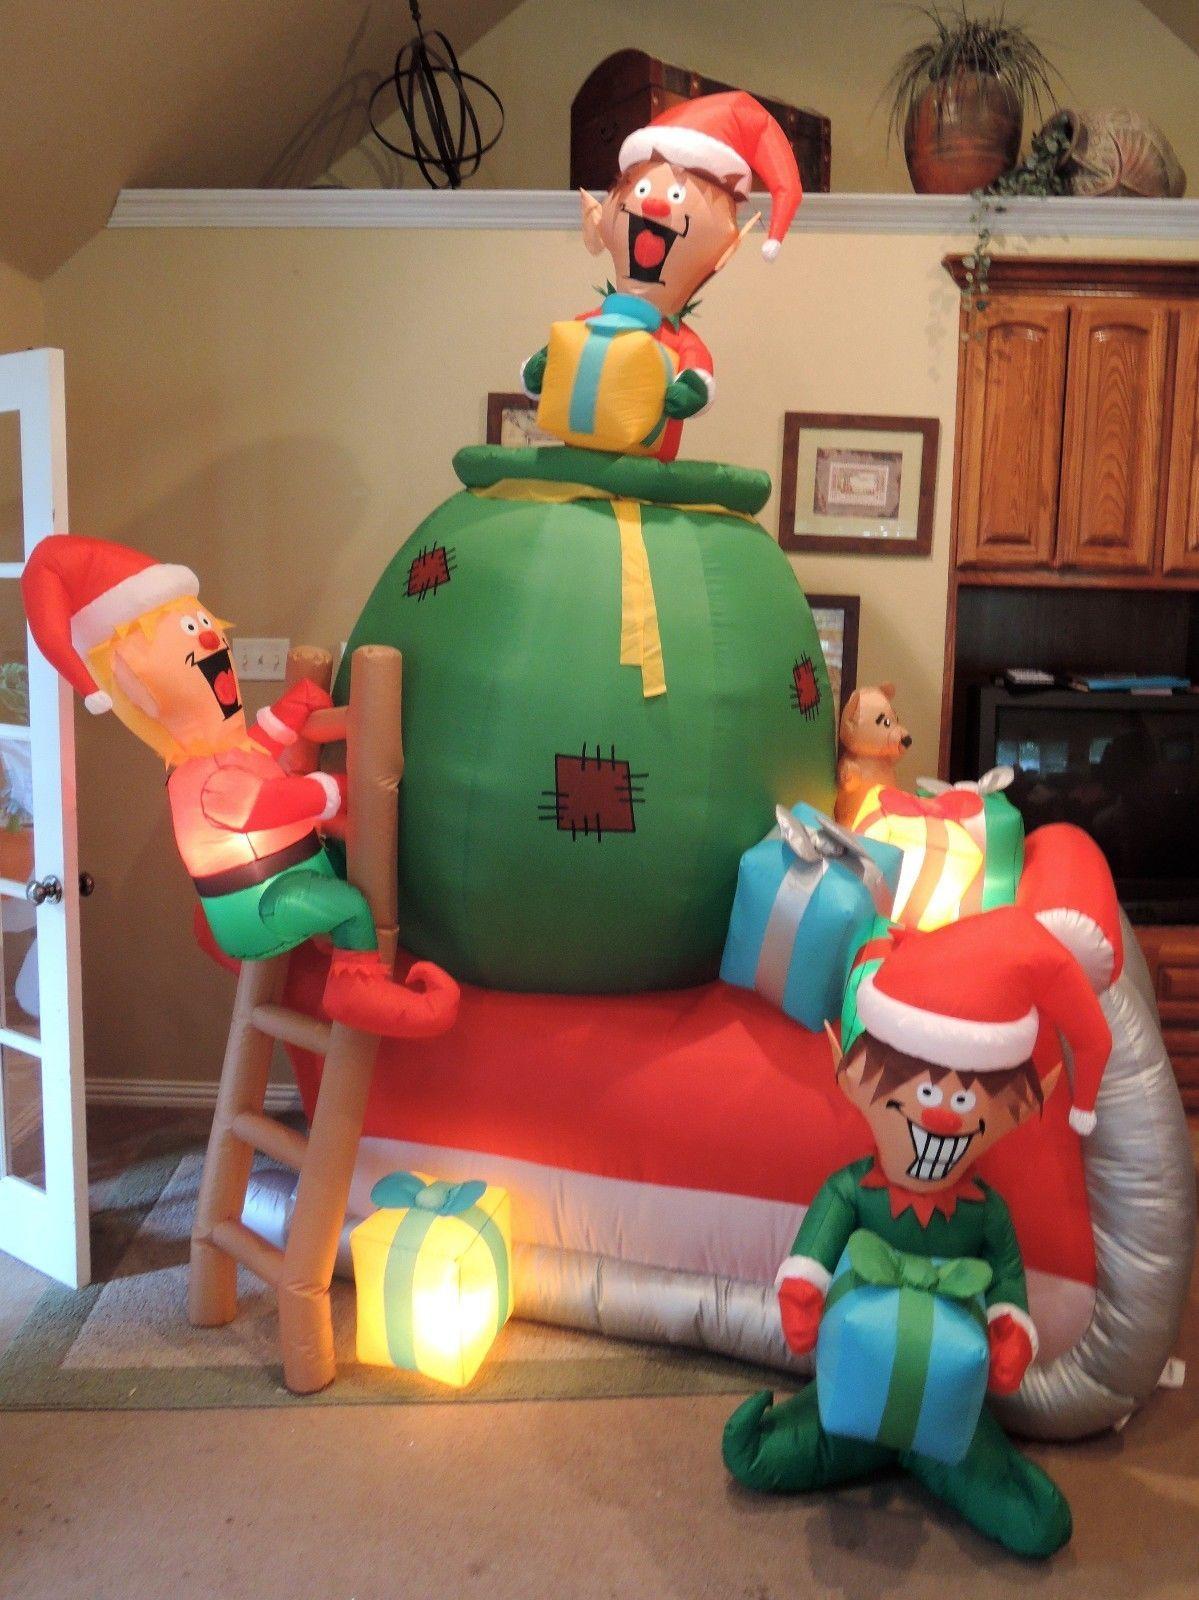 Gemmy Prototype Christmas Nutcracker Inflatable Airblown